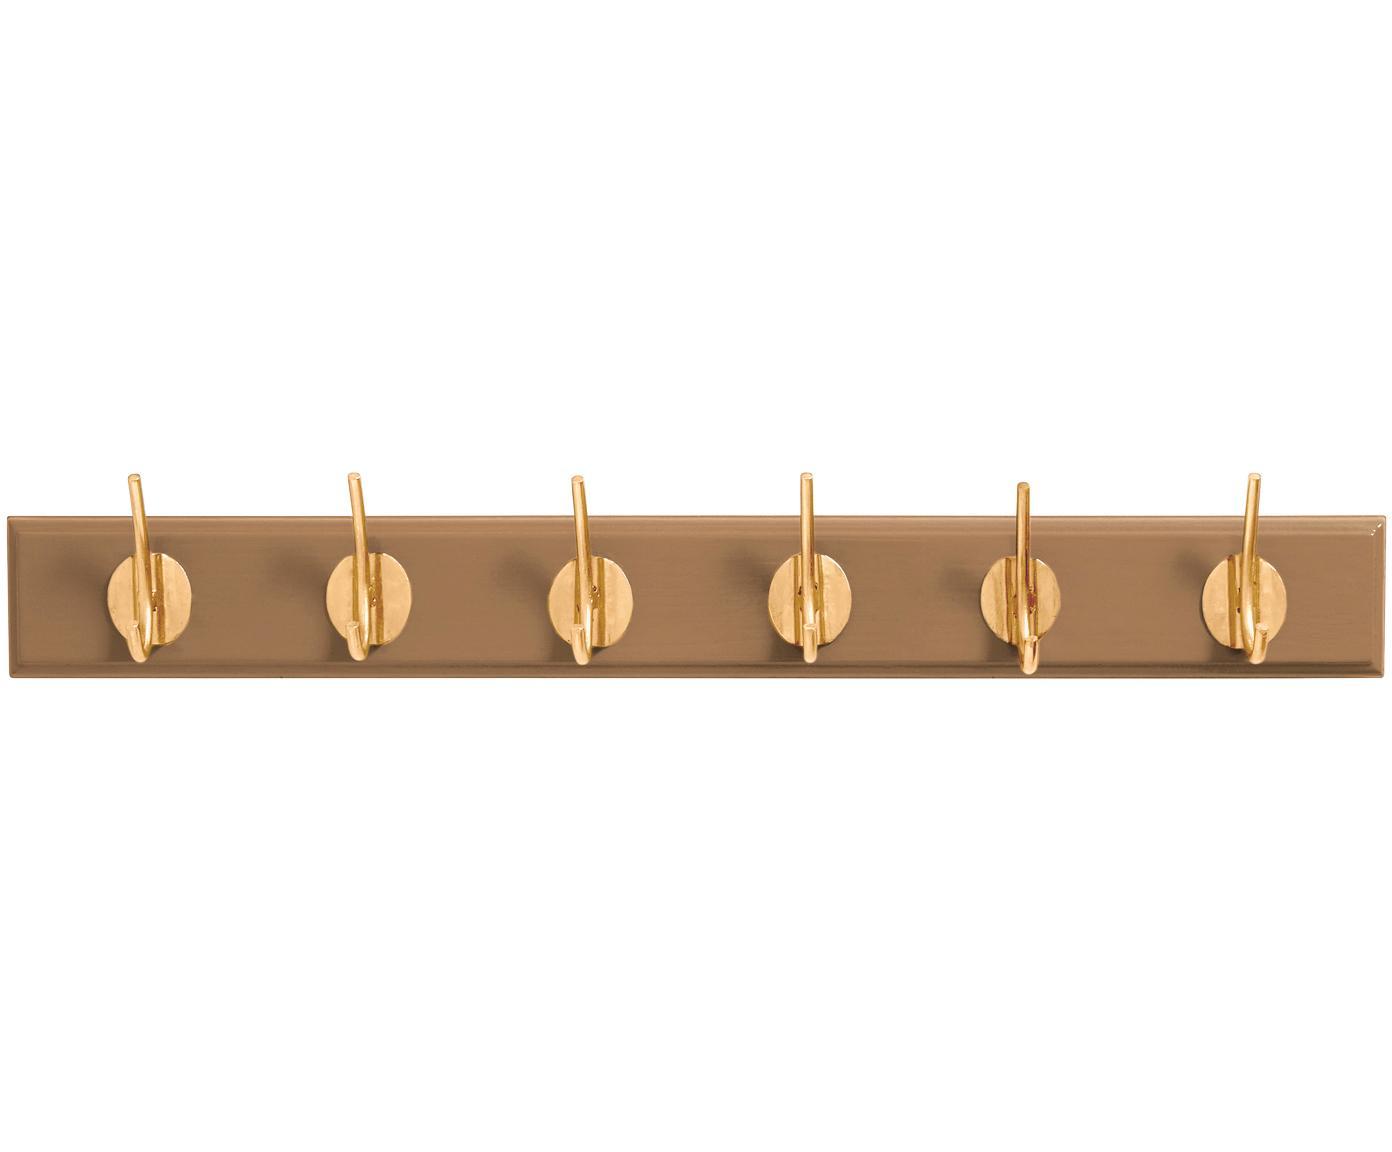 Gaderobenhaken Aoife mit Metall-Haken, Leiste: Mitteldichte Holzfaserpla, Haken: Messing, Kamelbraun, 60 x 7 cm